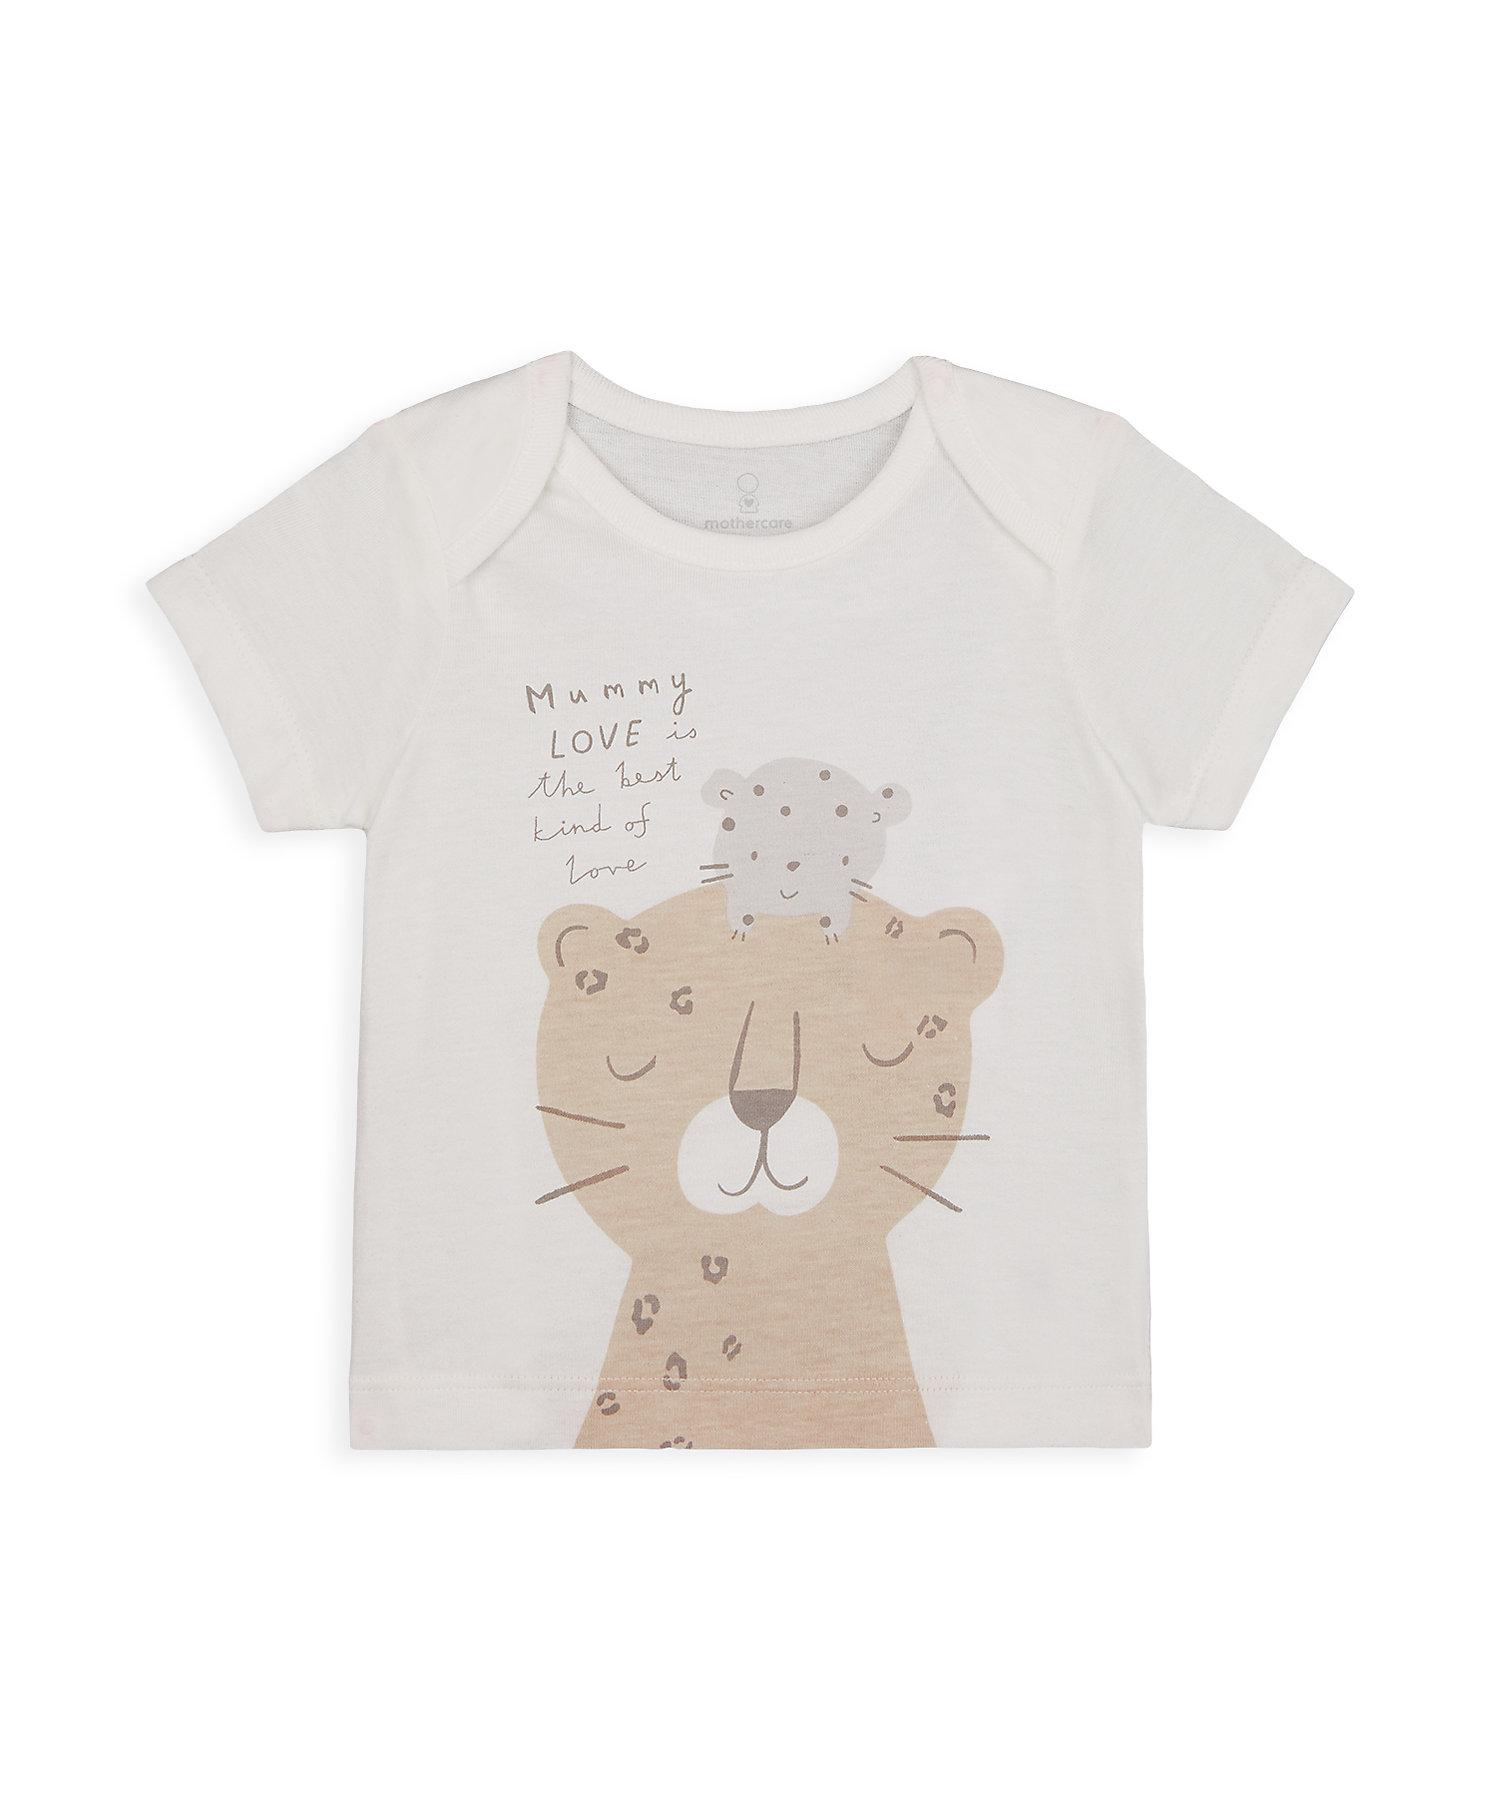 Mothercare | Unisex Half Sleeves T-Shirt Leopard Print - White